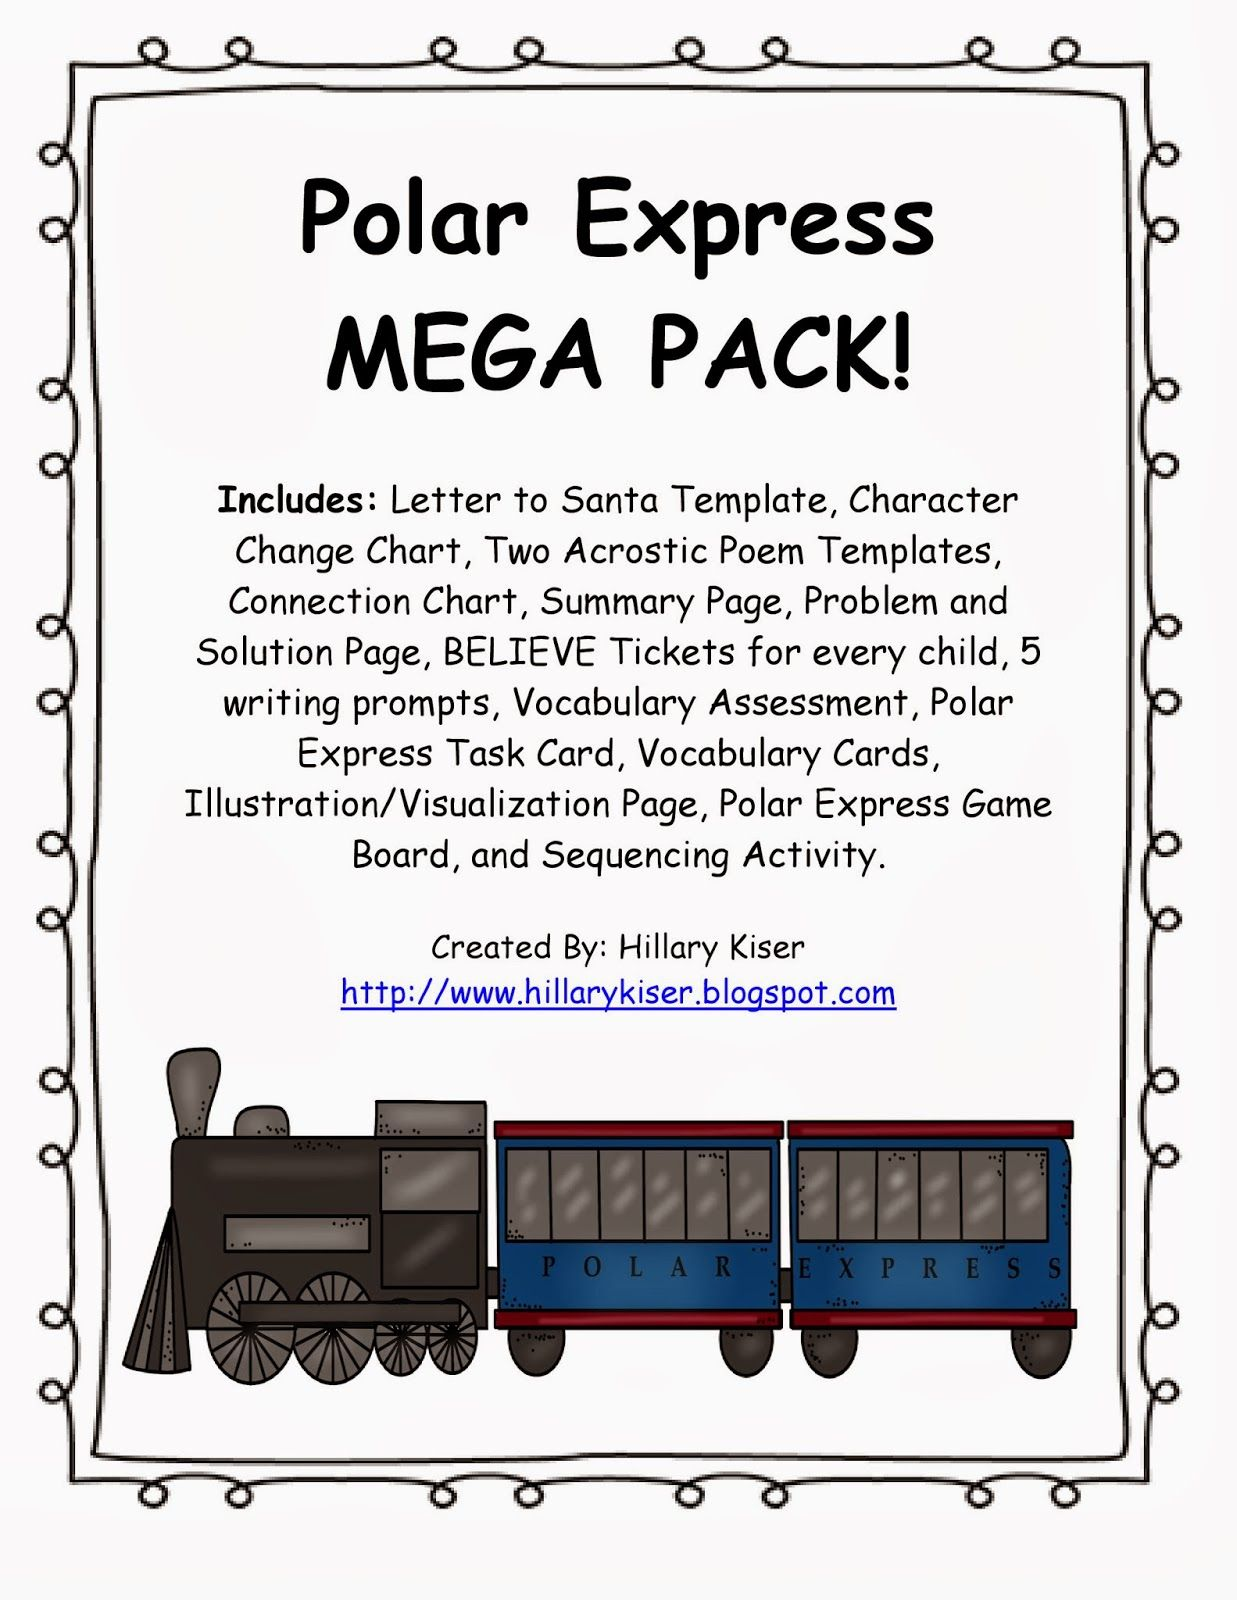 Adventures Of Teaching Polar Express Mega Pack